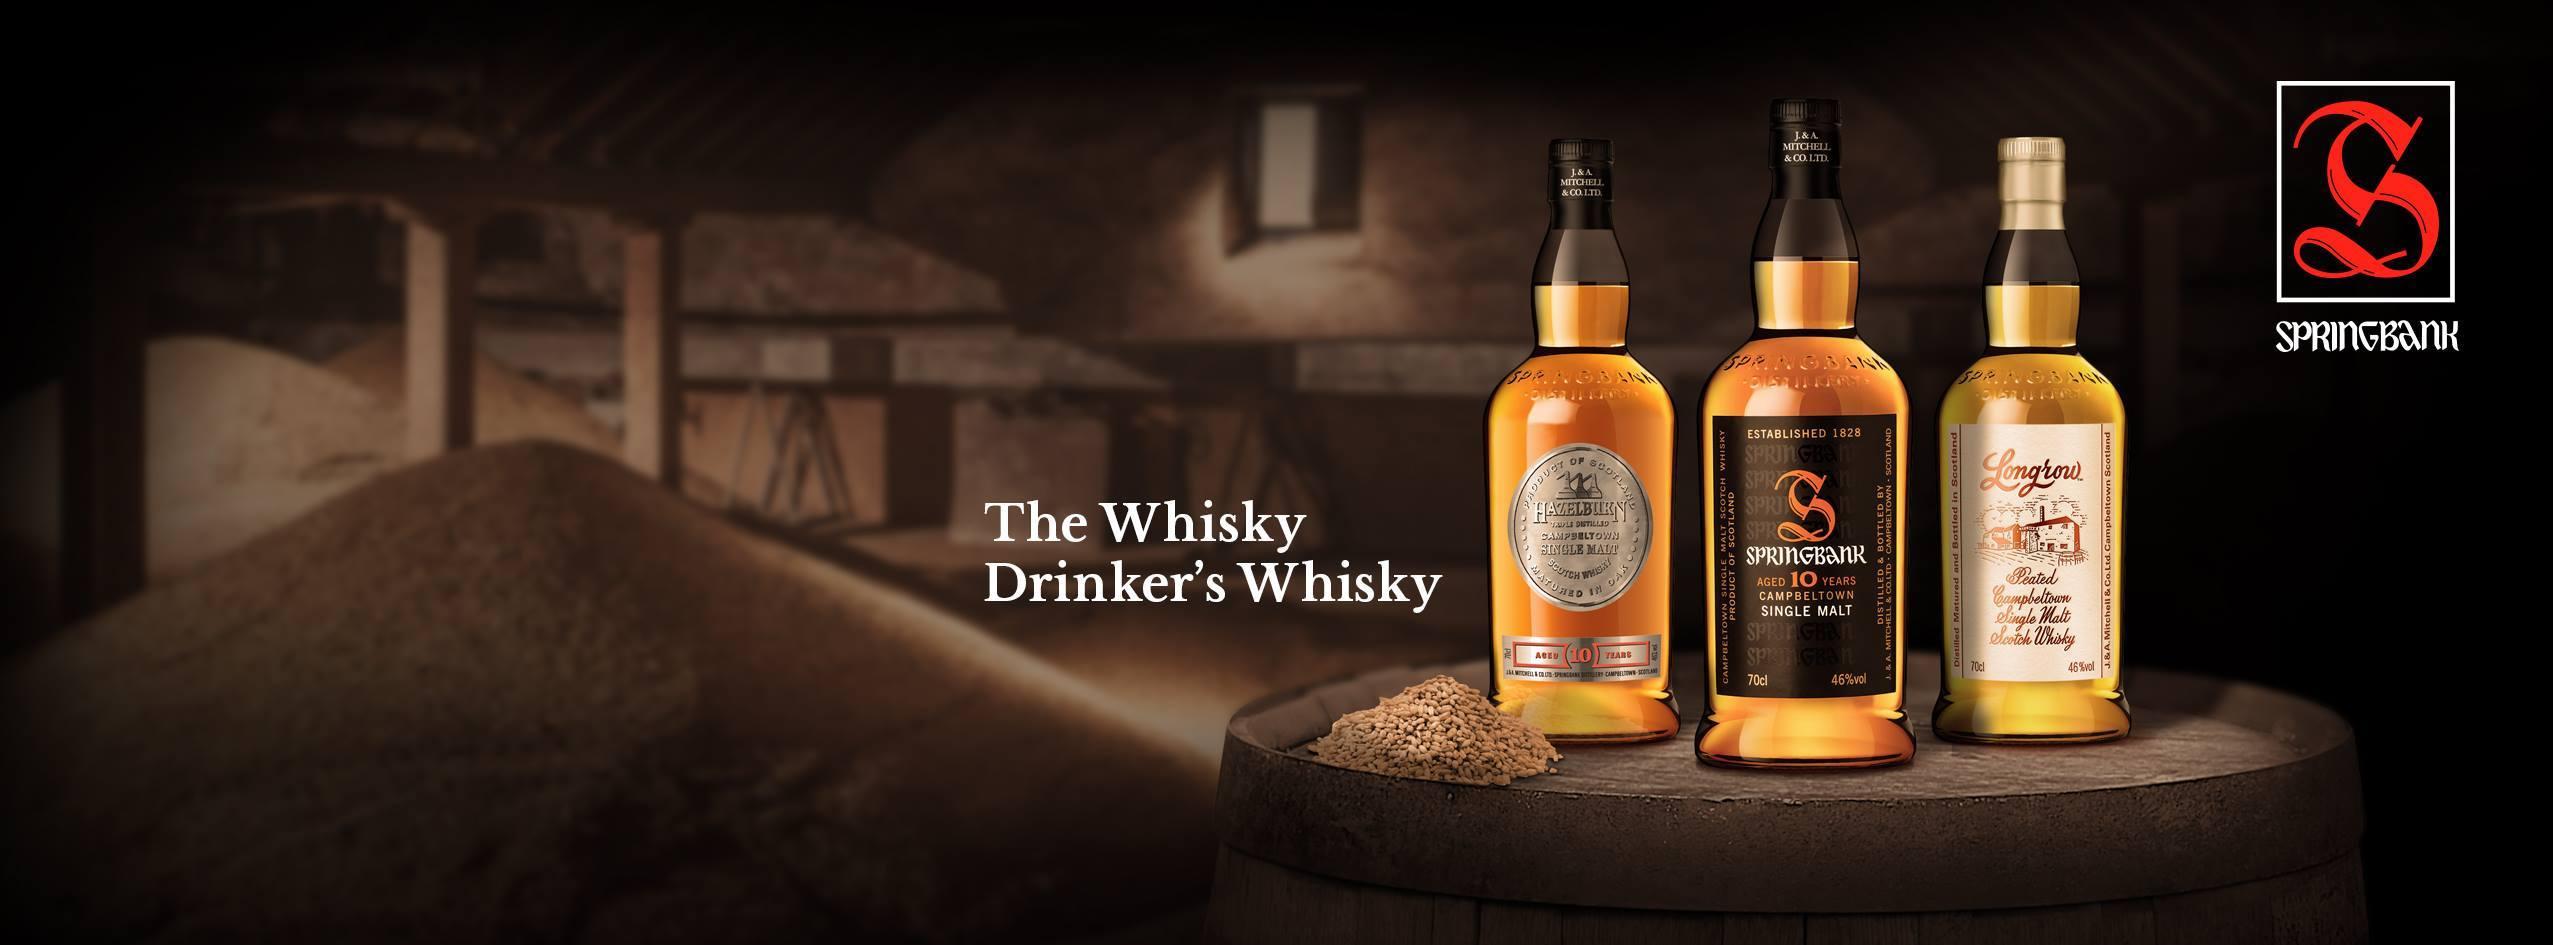 Soirée Whisky Springbank, Vendredi 20 novembre 2020